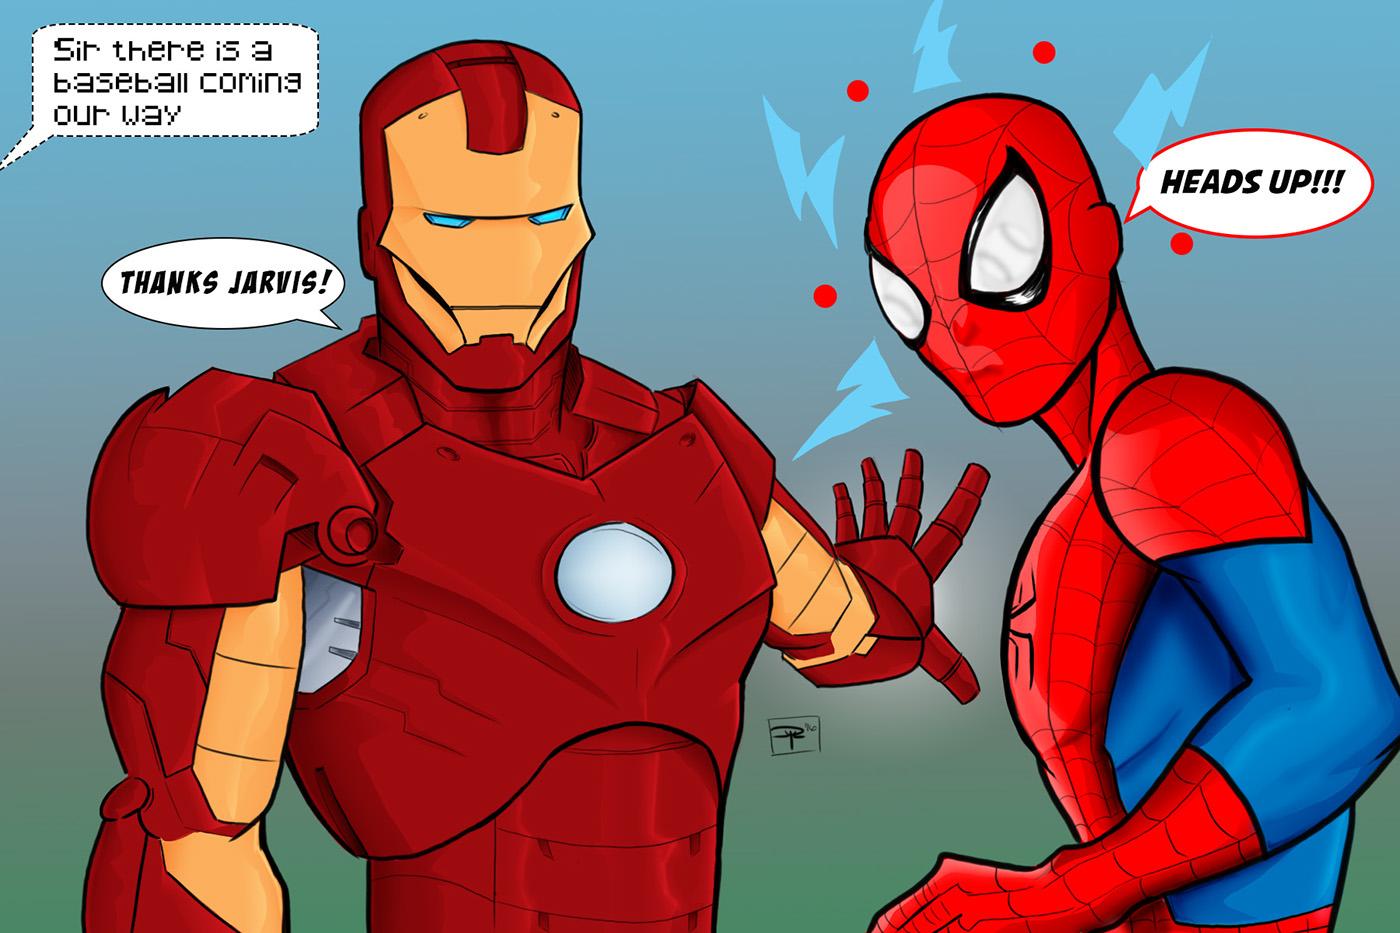 marvel spiderman ironman photoshop Digital Art  wacom